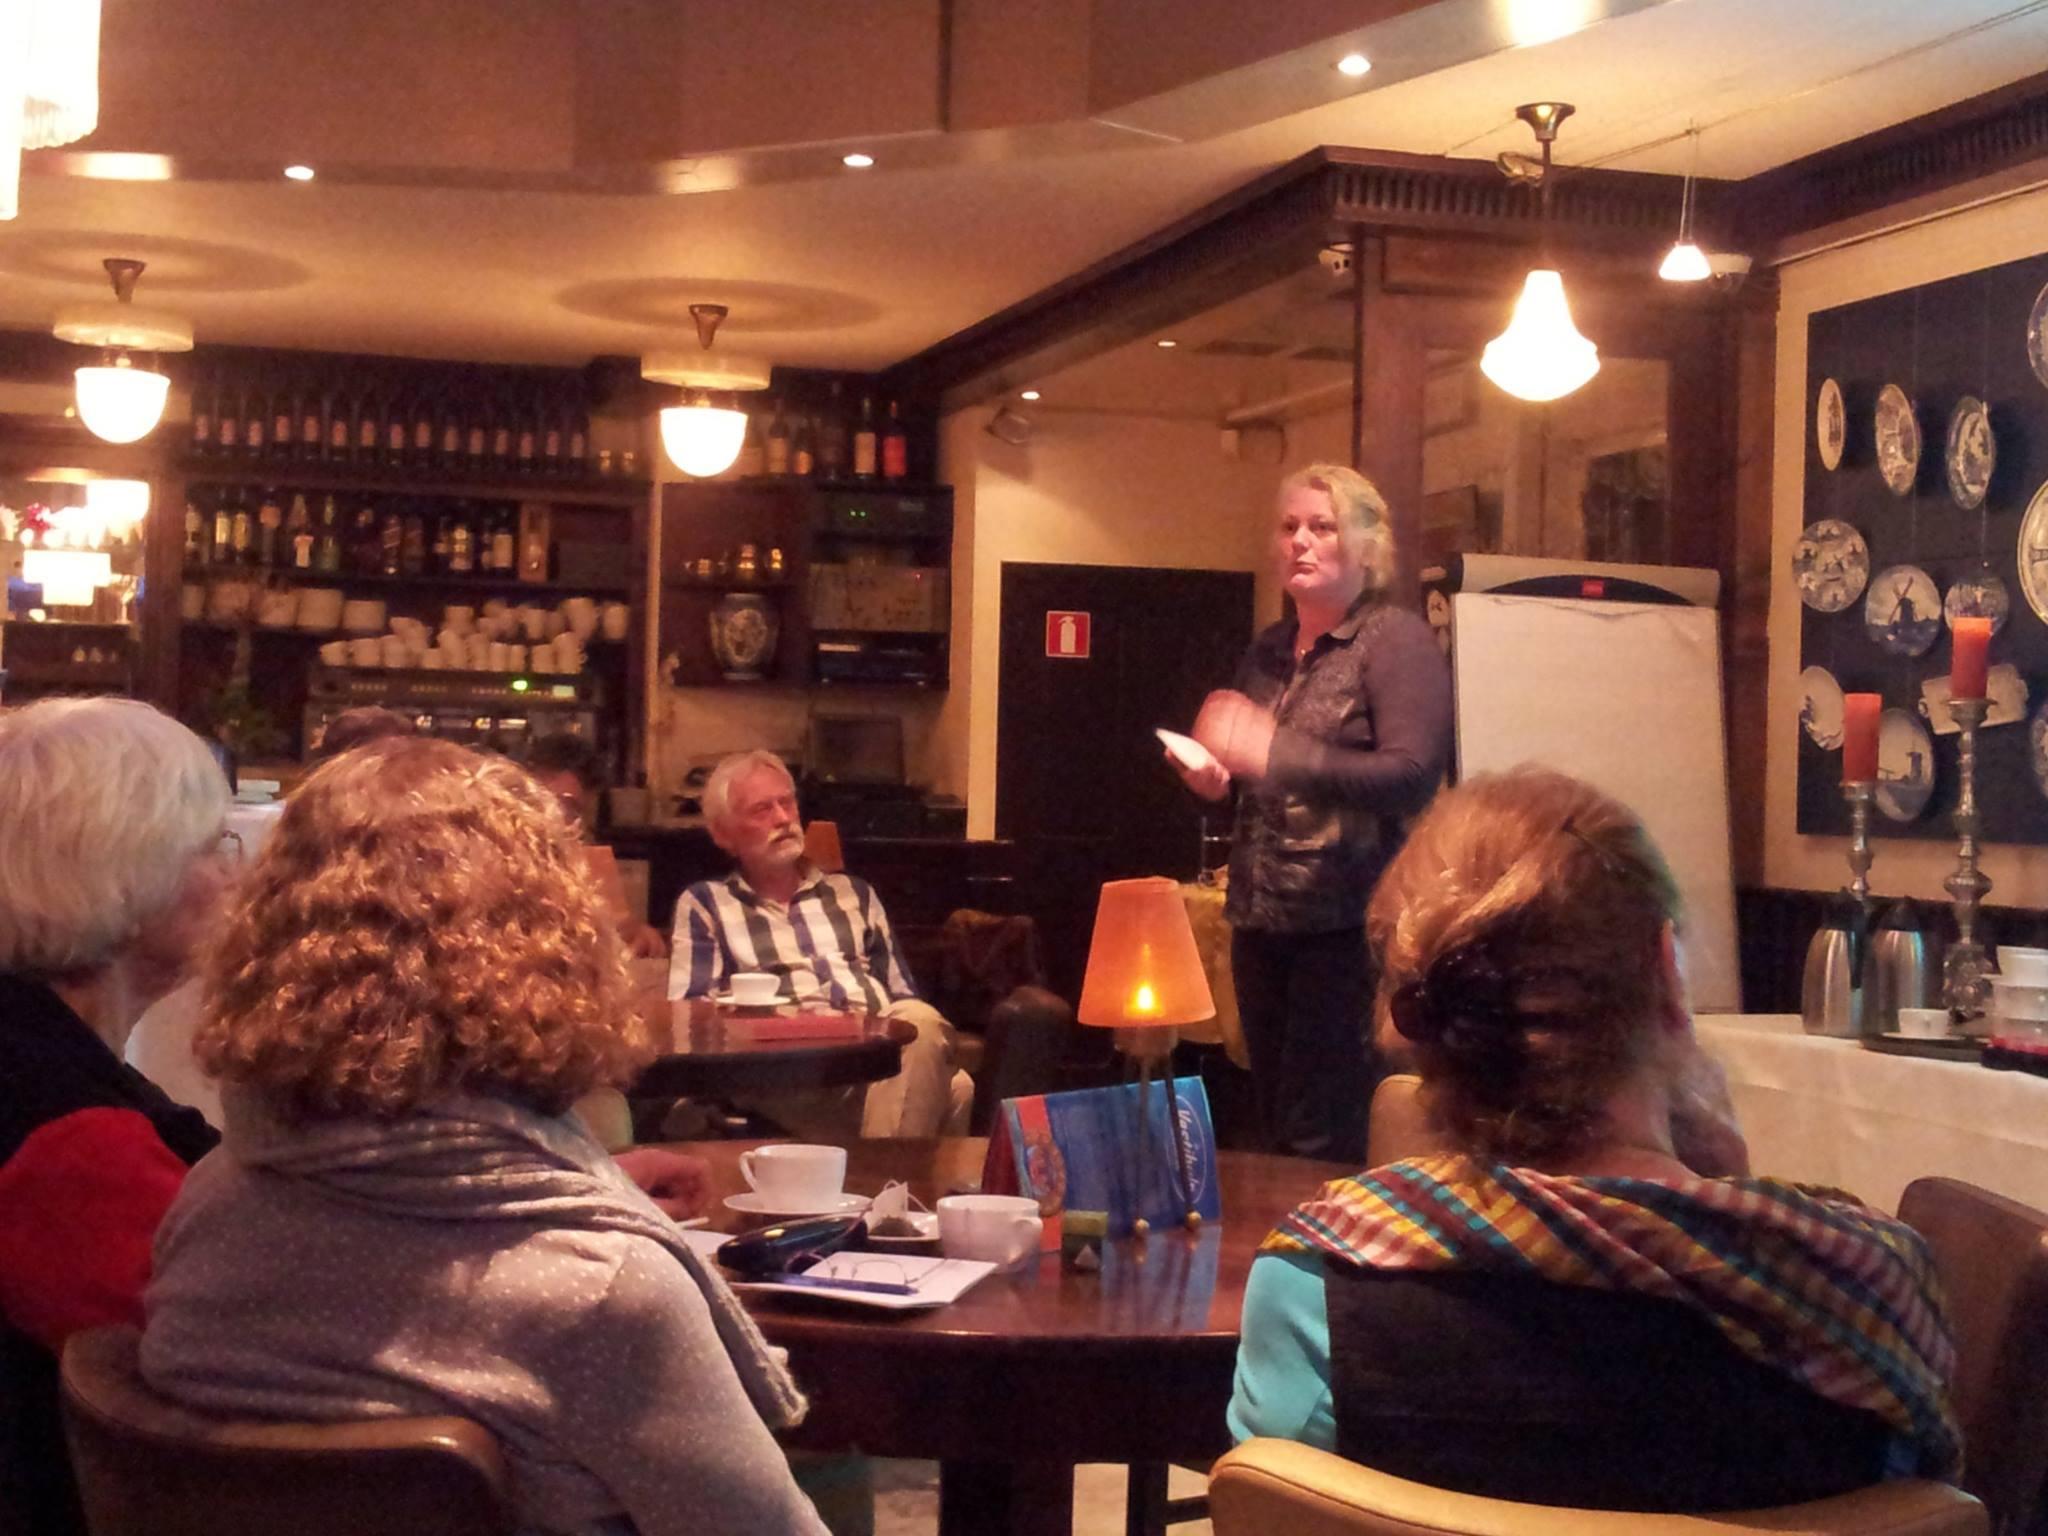 Humanistisch Café: Filosofe Saskia van der Werff over Ubuntu, Afrikaans humanisme